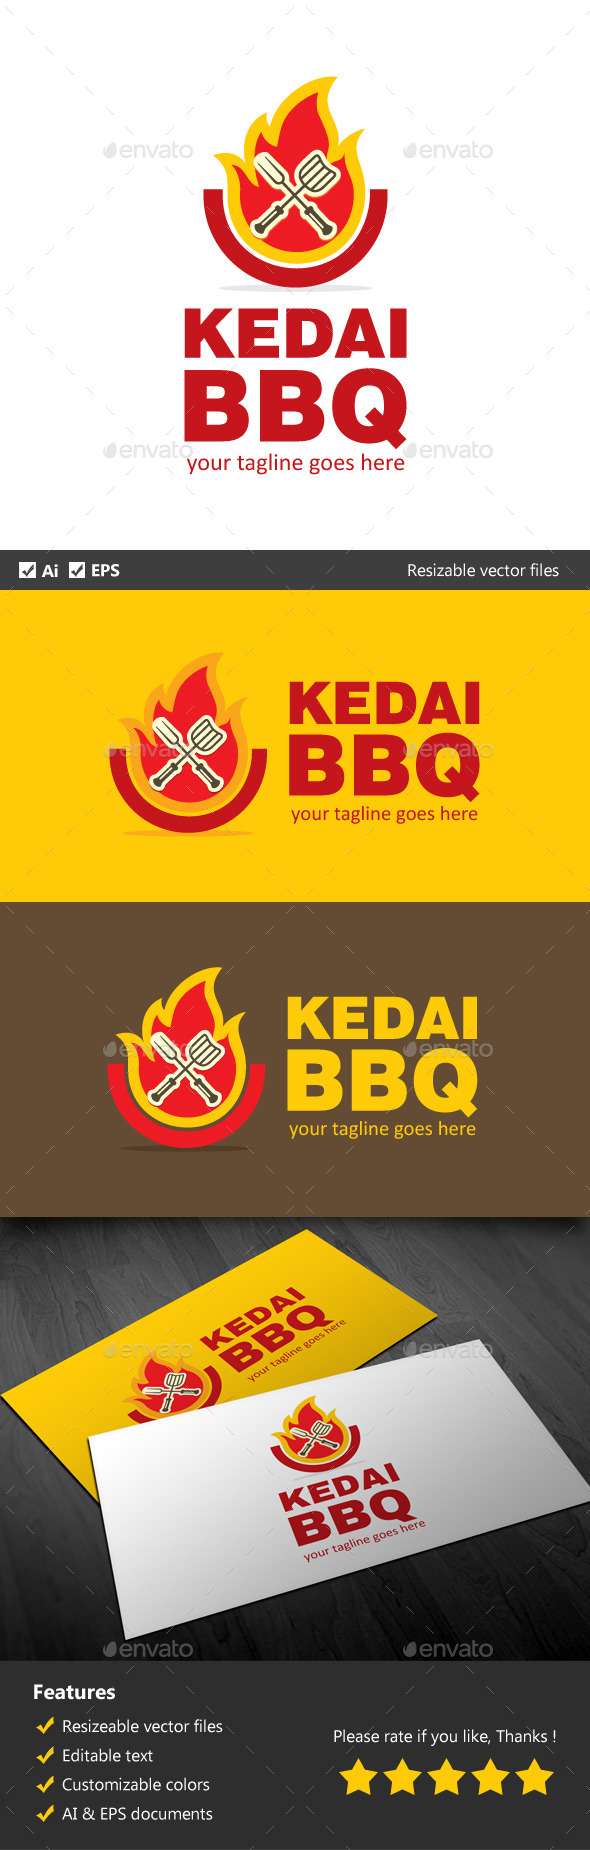 Kedai BBQ - Food Logo Templates